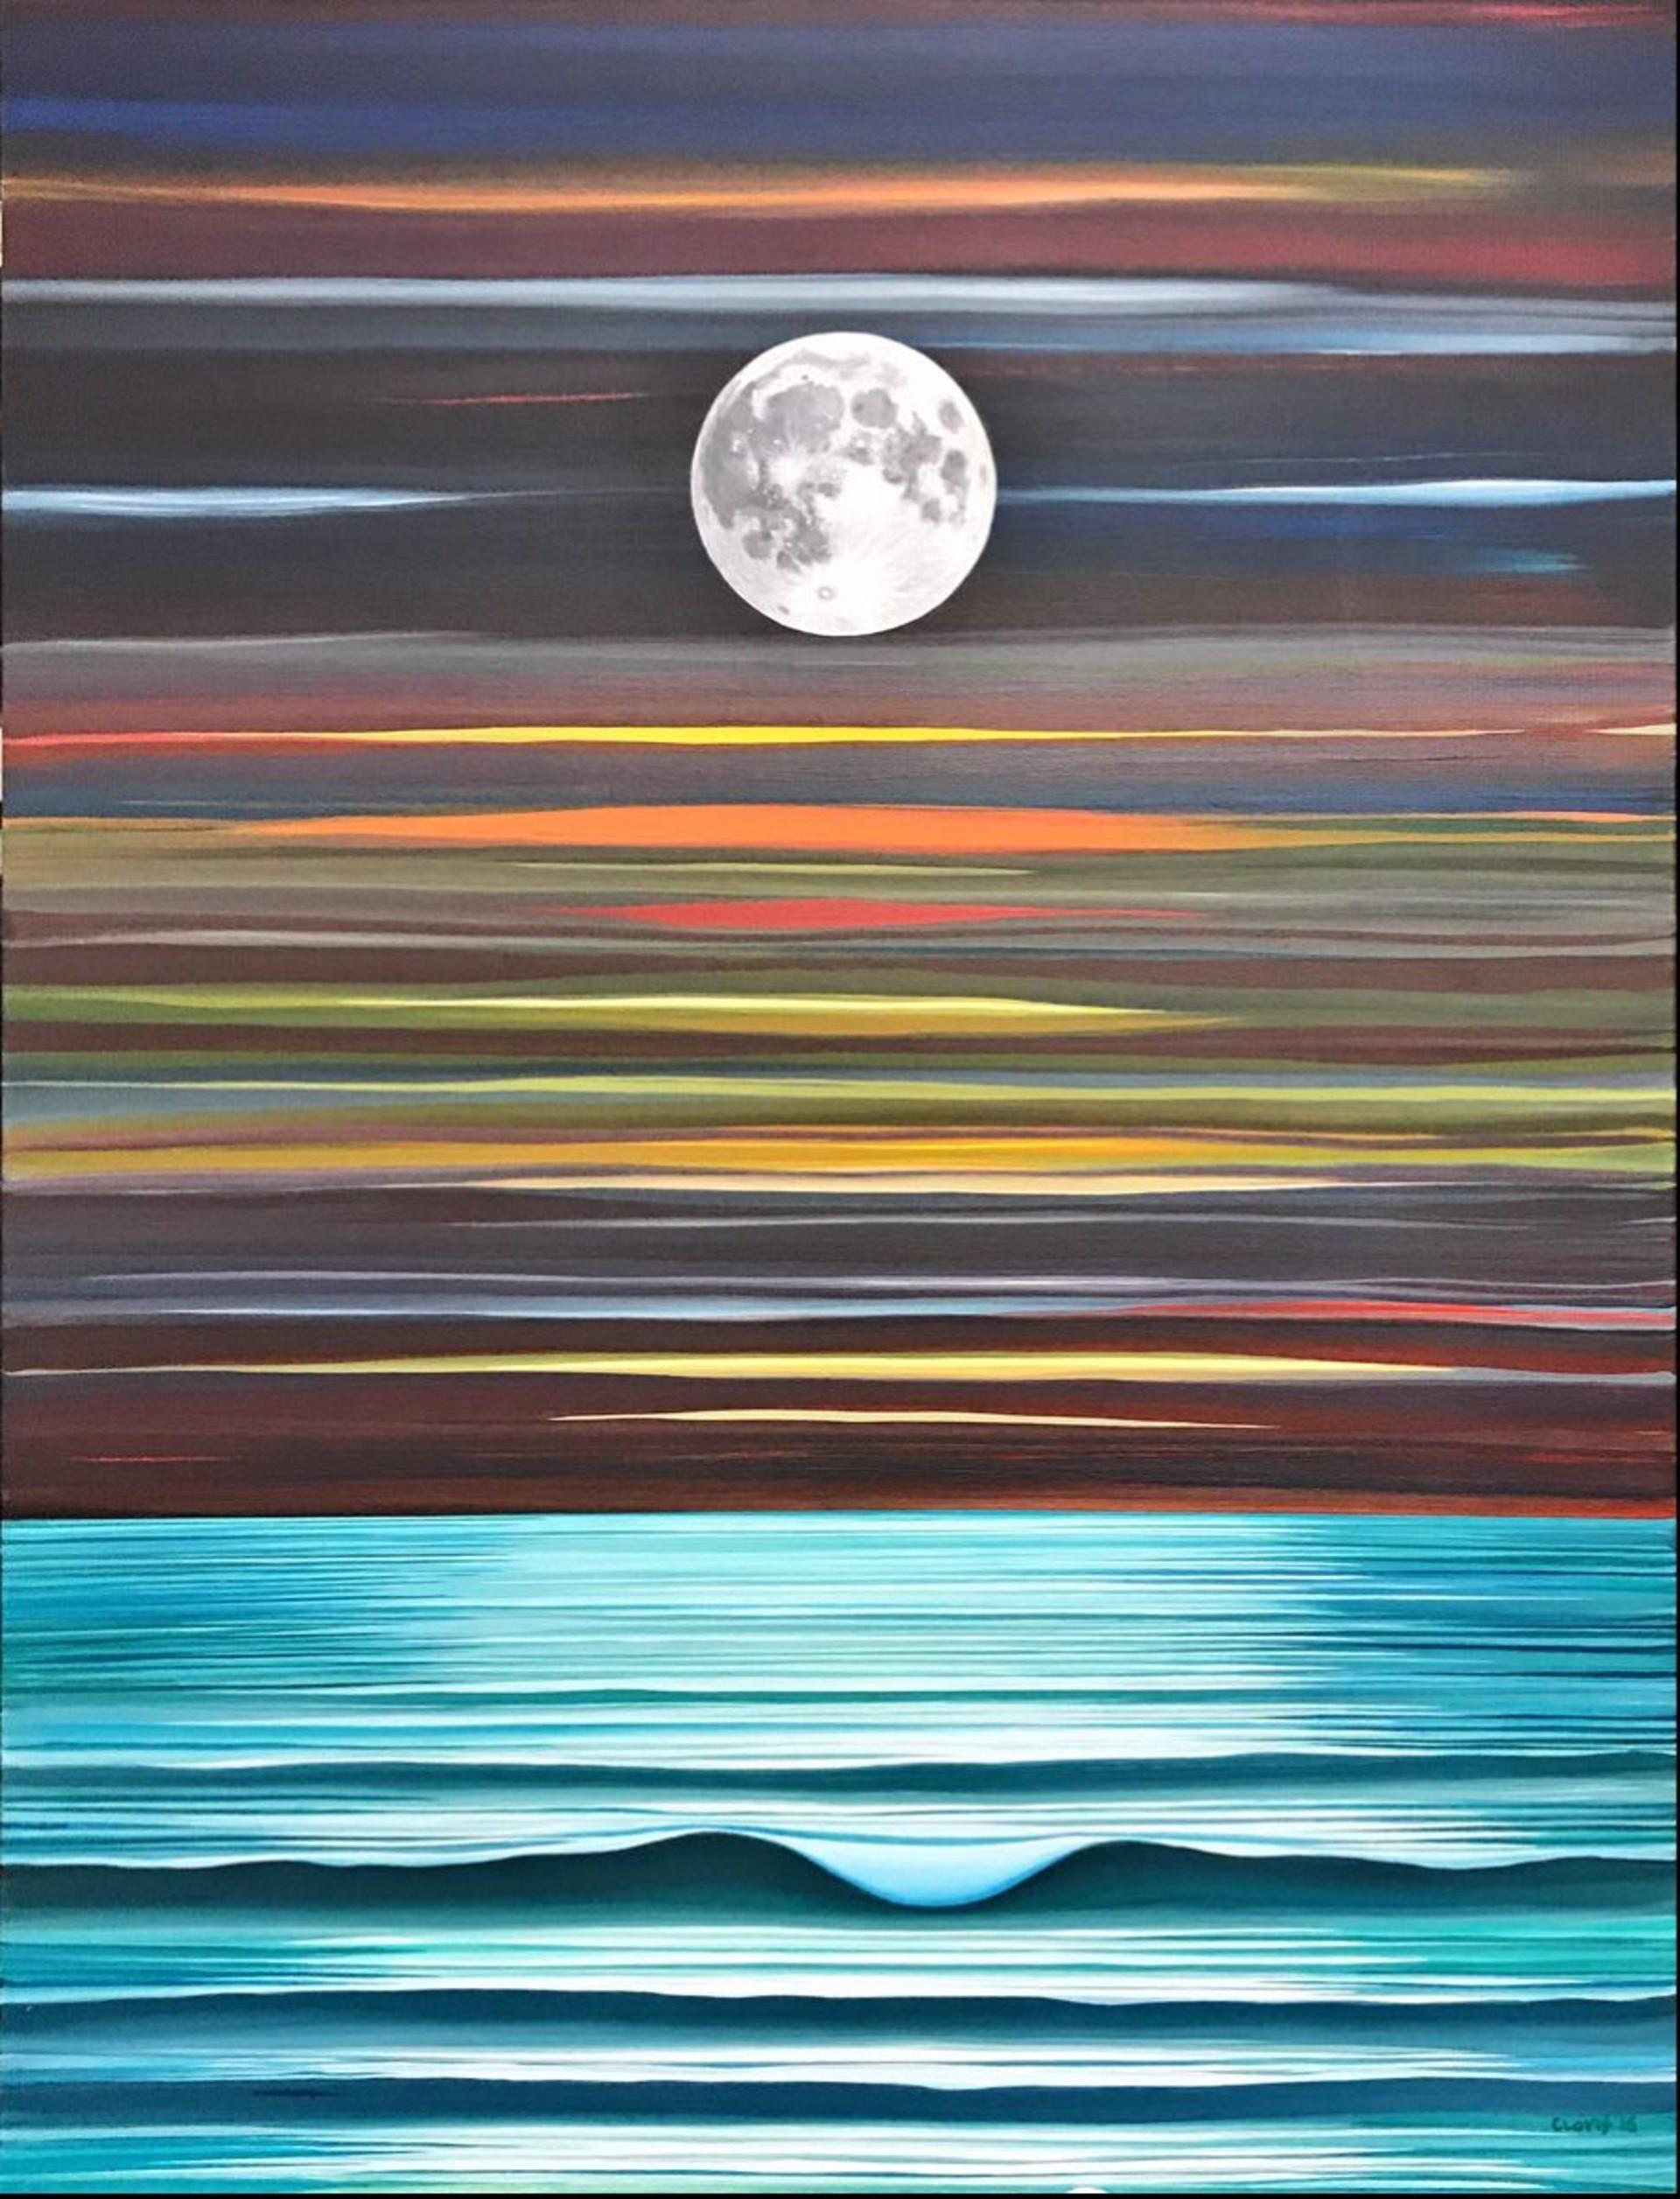 Moon Shiner by Burke Malcom